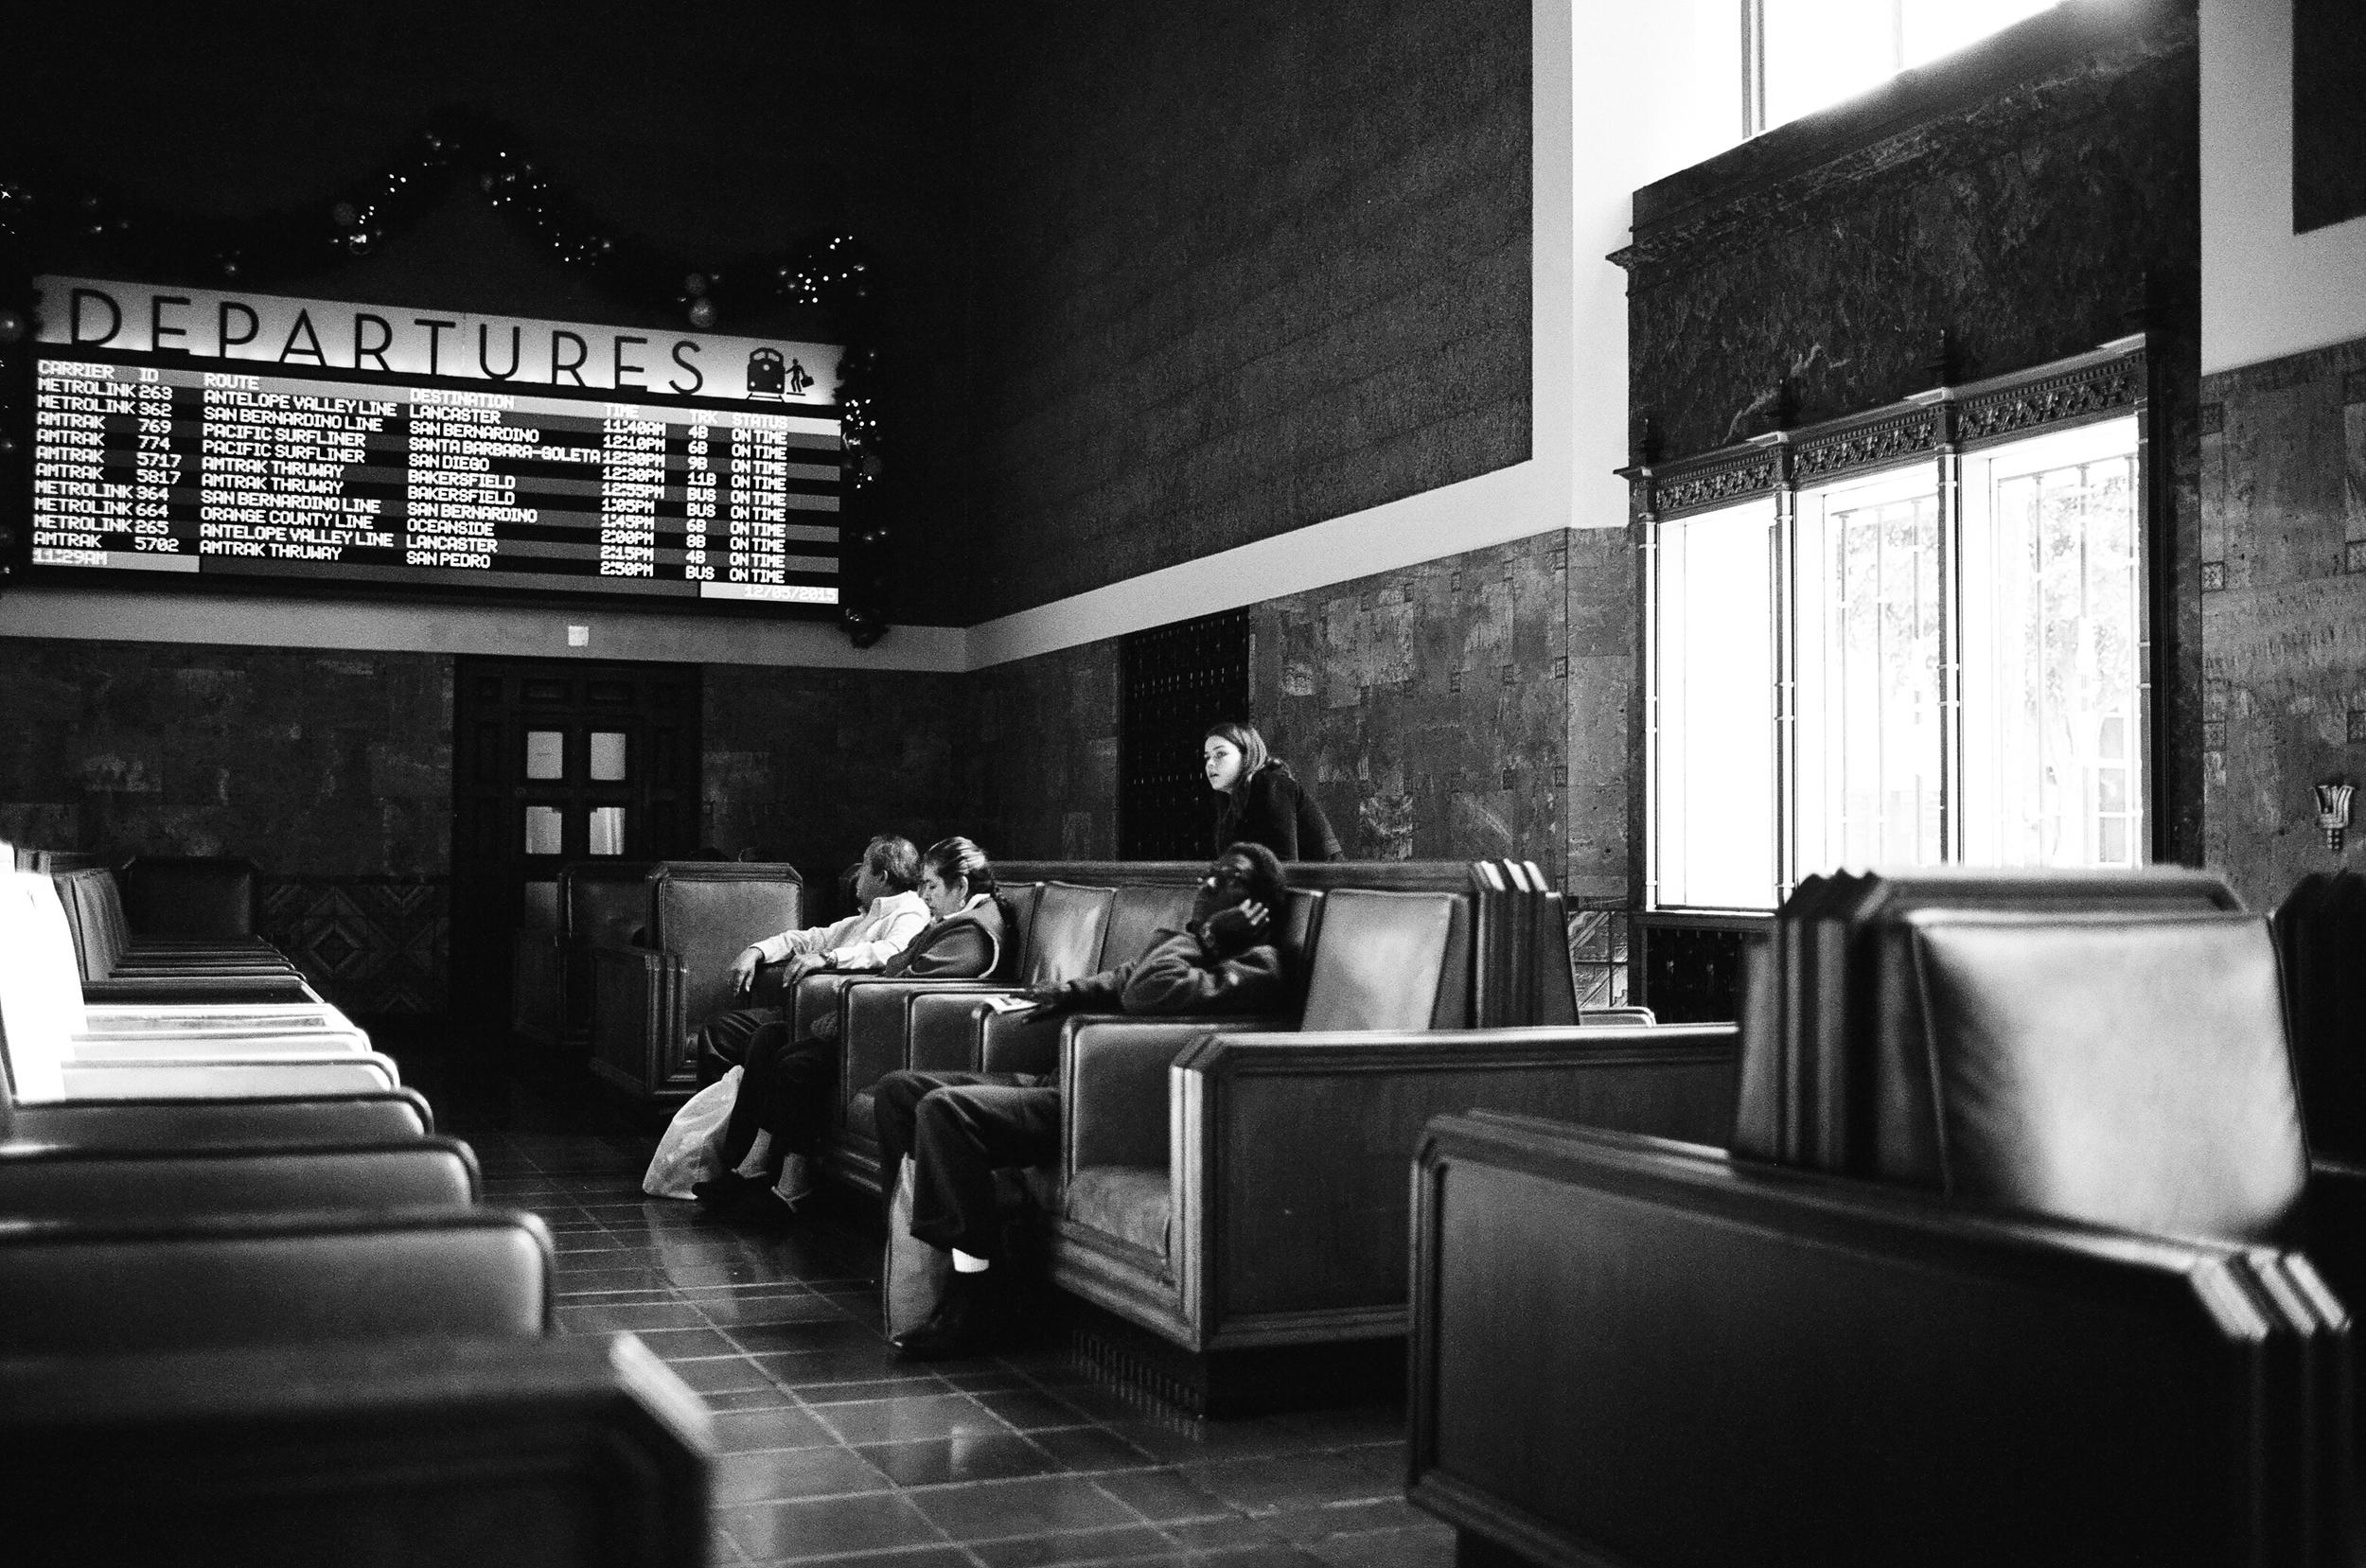 Waiting is the hardest part. - Union Station - DTLA